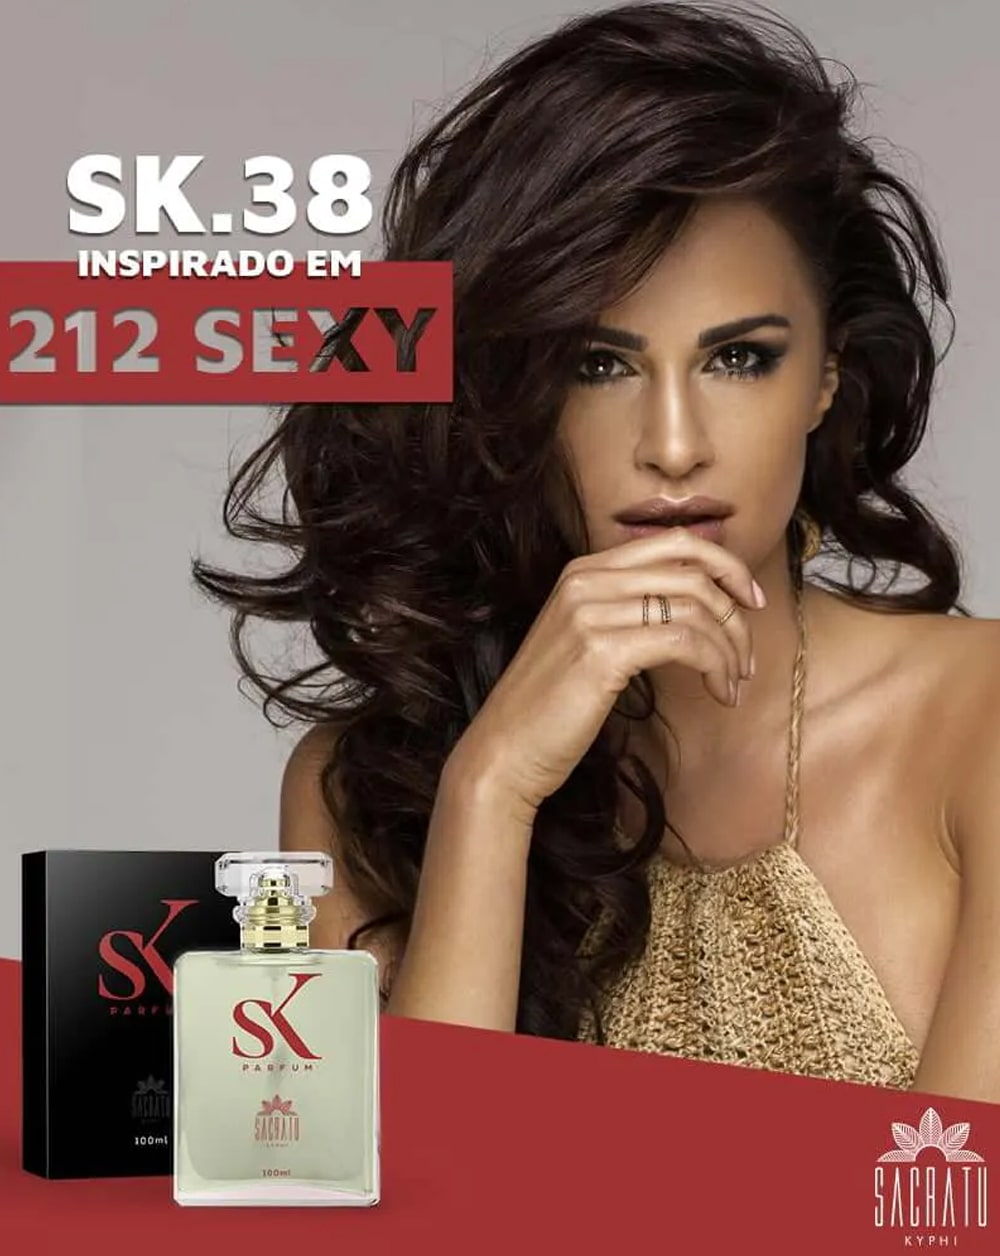 SK 38 Inspirado no 212 Sexy by Carolina Herrera